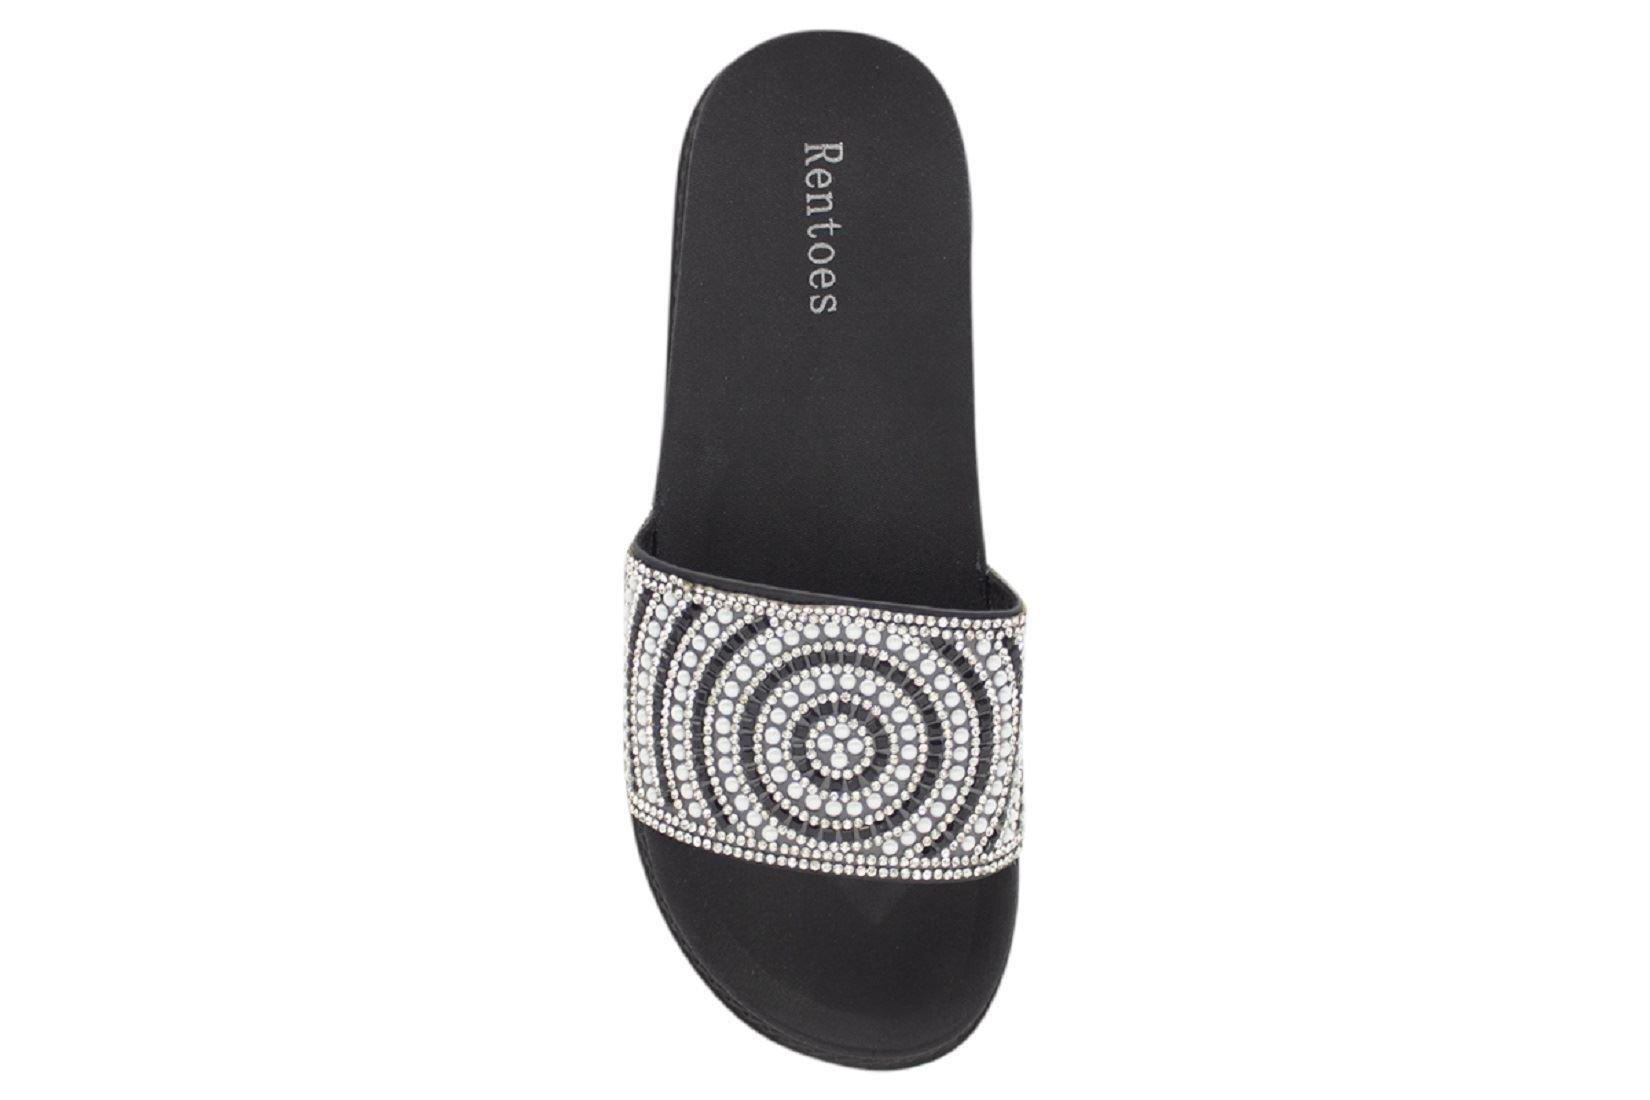 Womens-Sliders-Casual-Slippers-Mules-Ladies-Diamante-Flip-Flop-Sandals-Shoes thumbnail 48